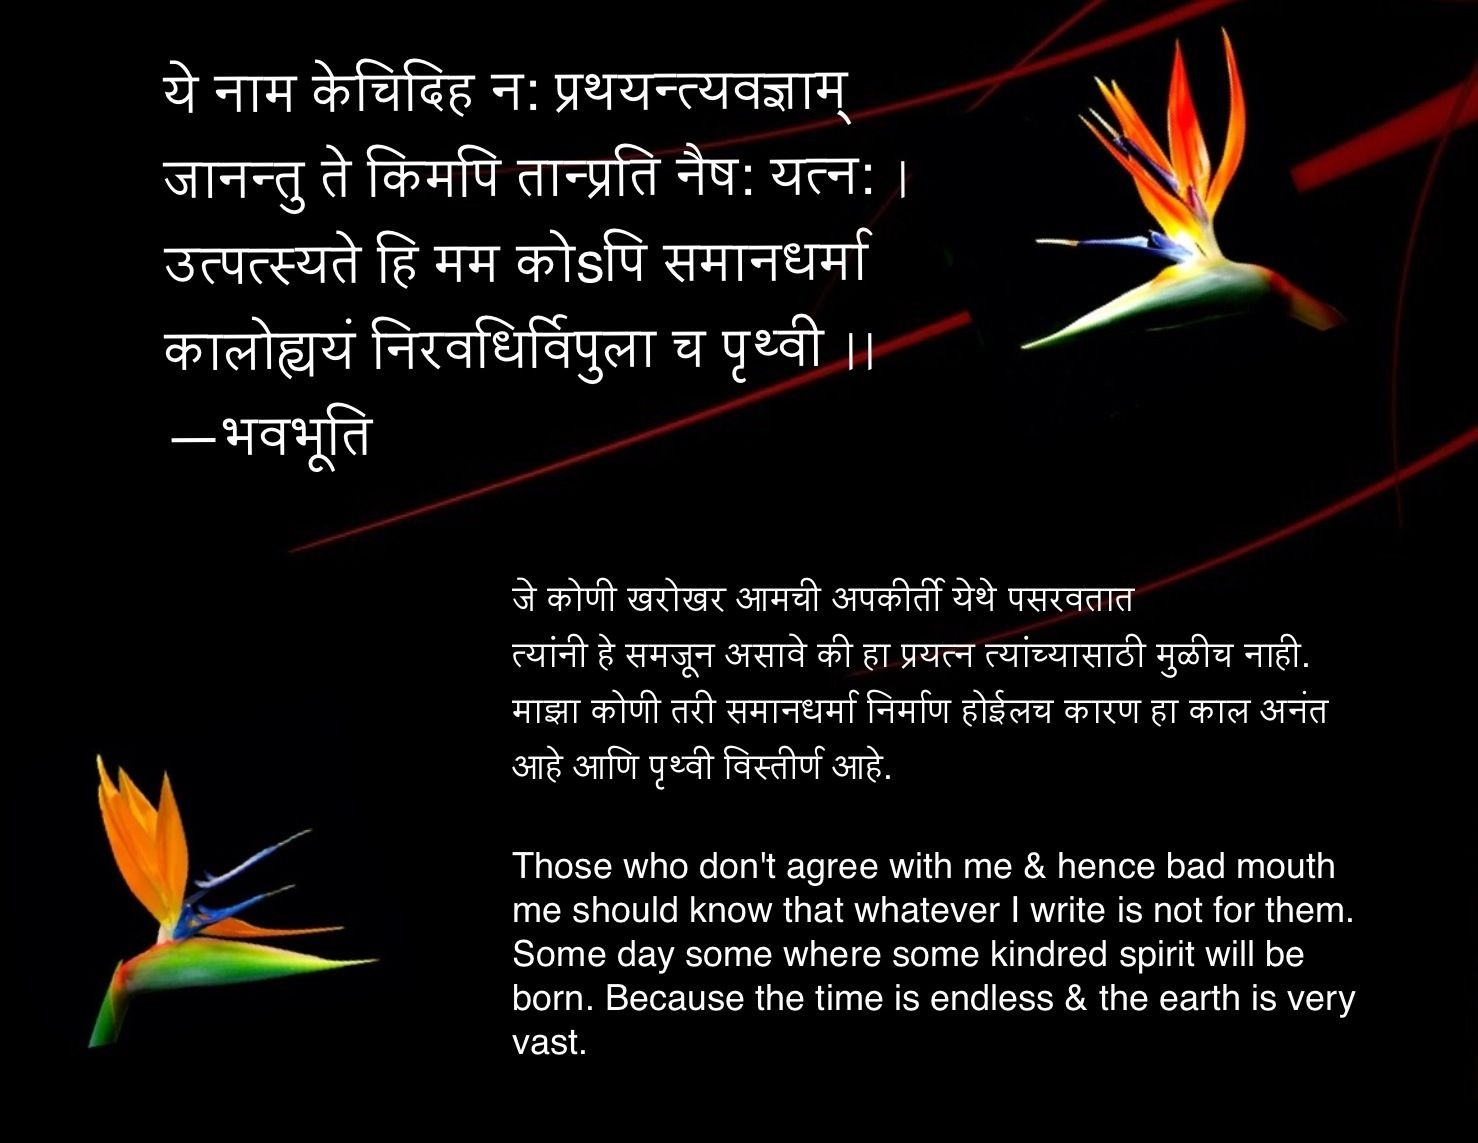 Sanskrit quote 11 विपुला च पृथ्वी in 2019 Sanskrit